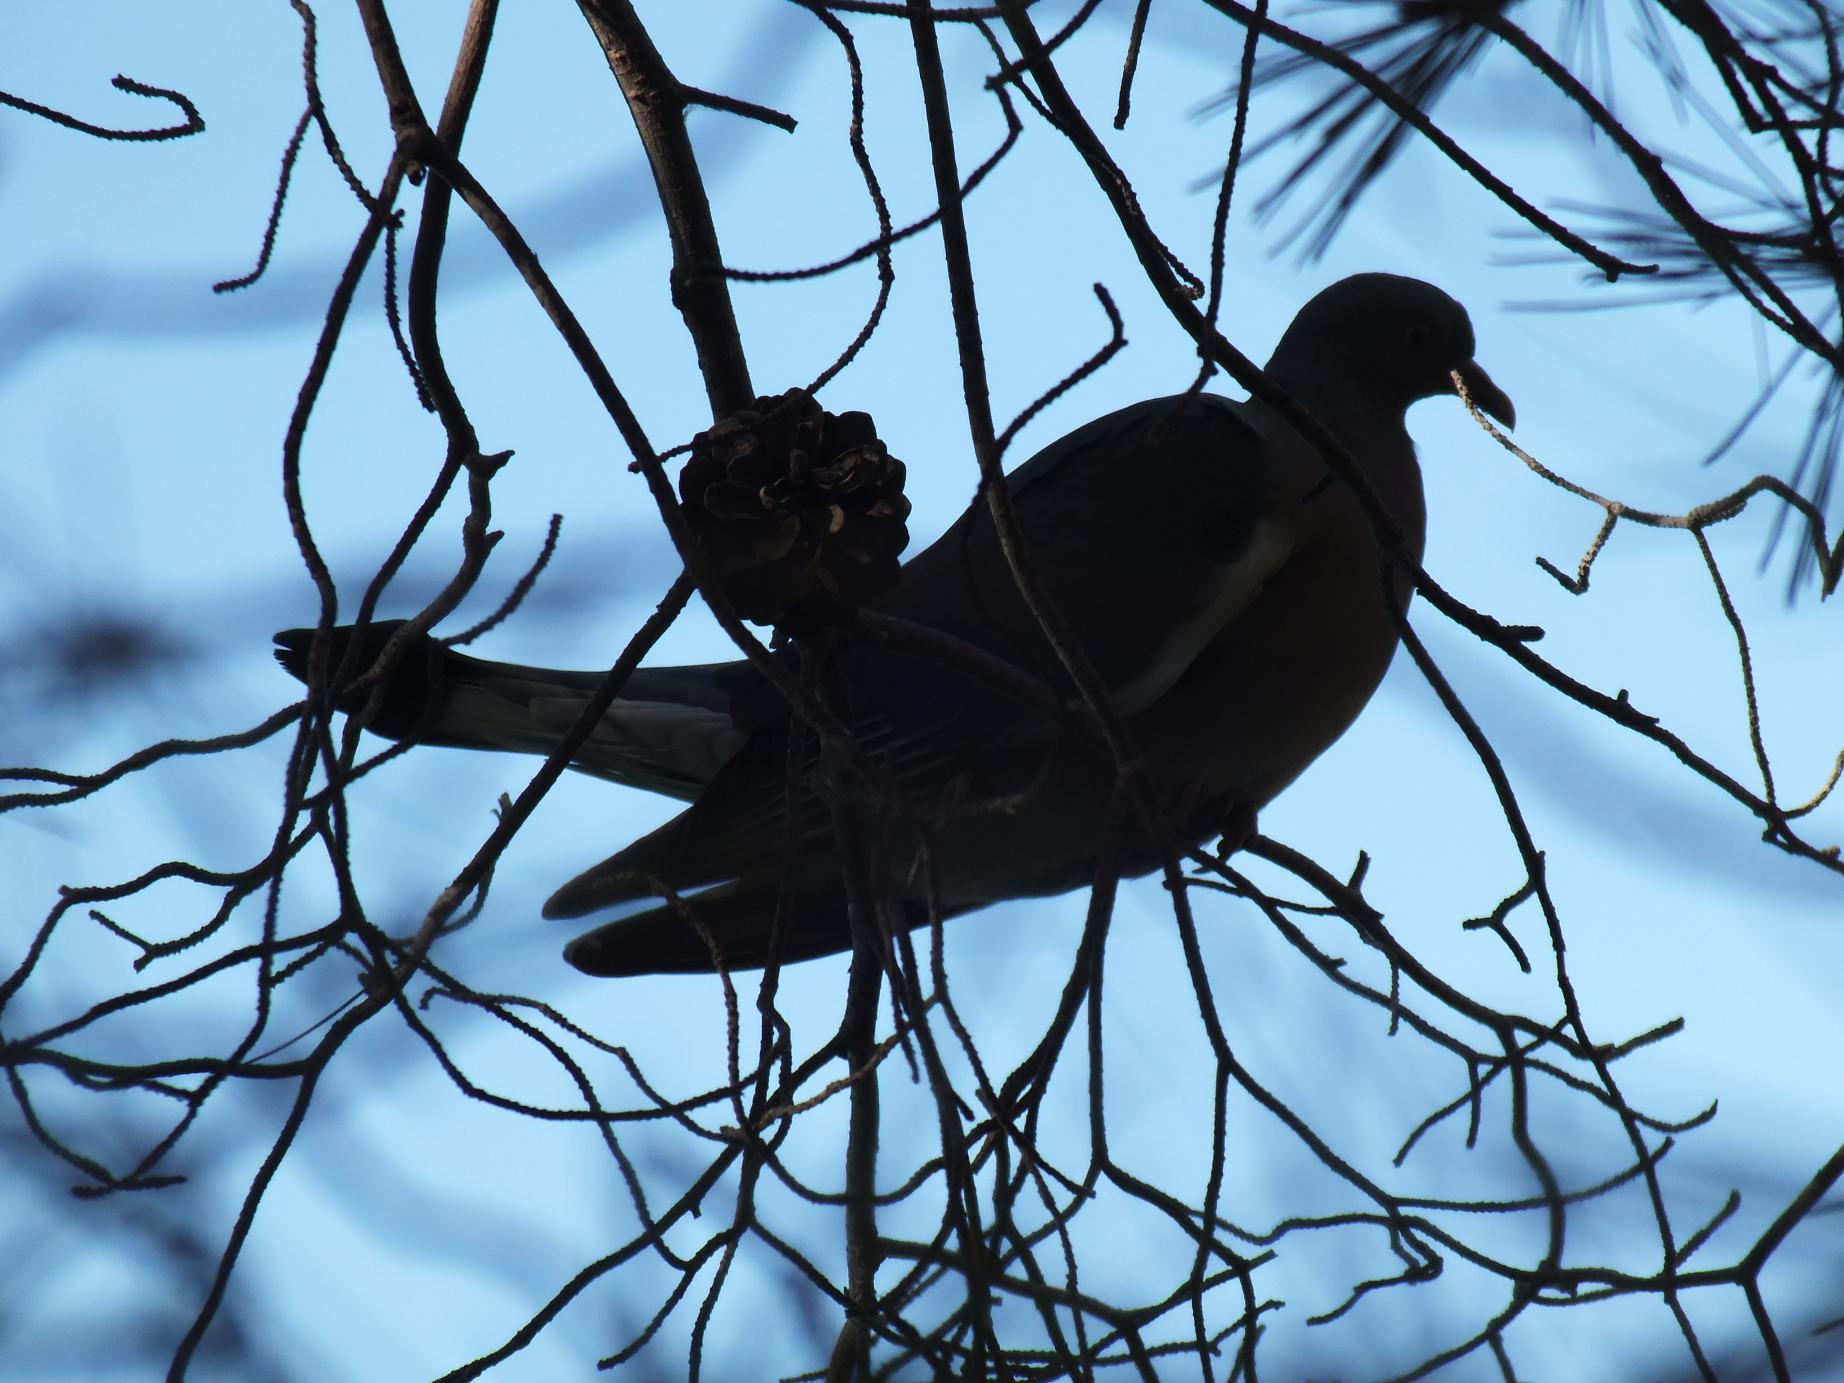 Salou_Cami de Ronda_pigeon2